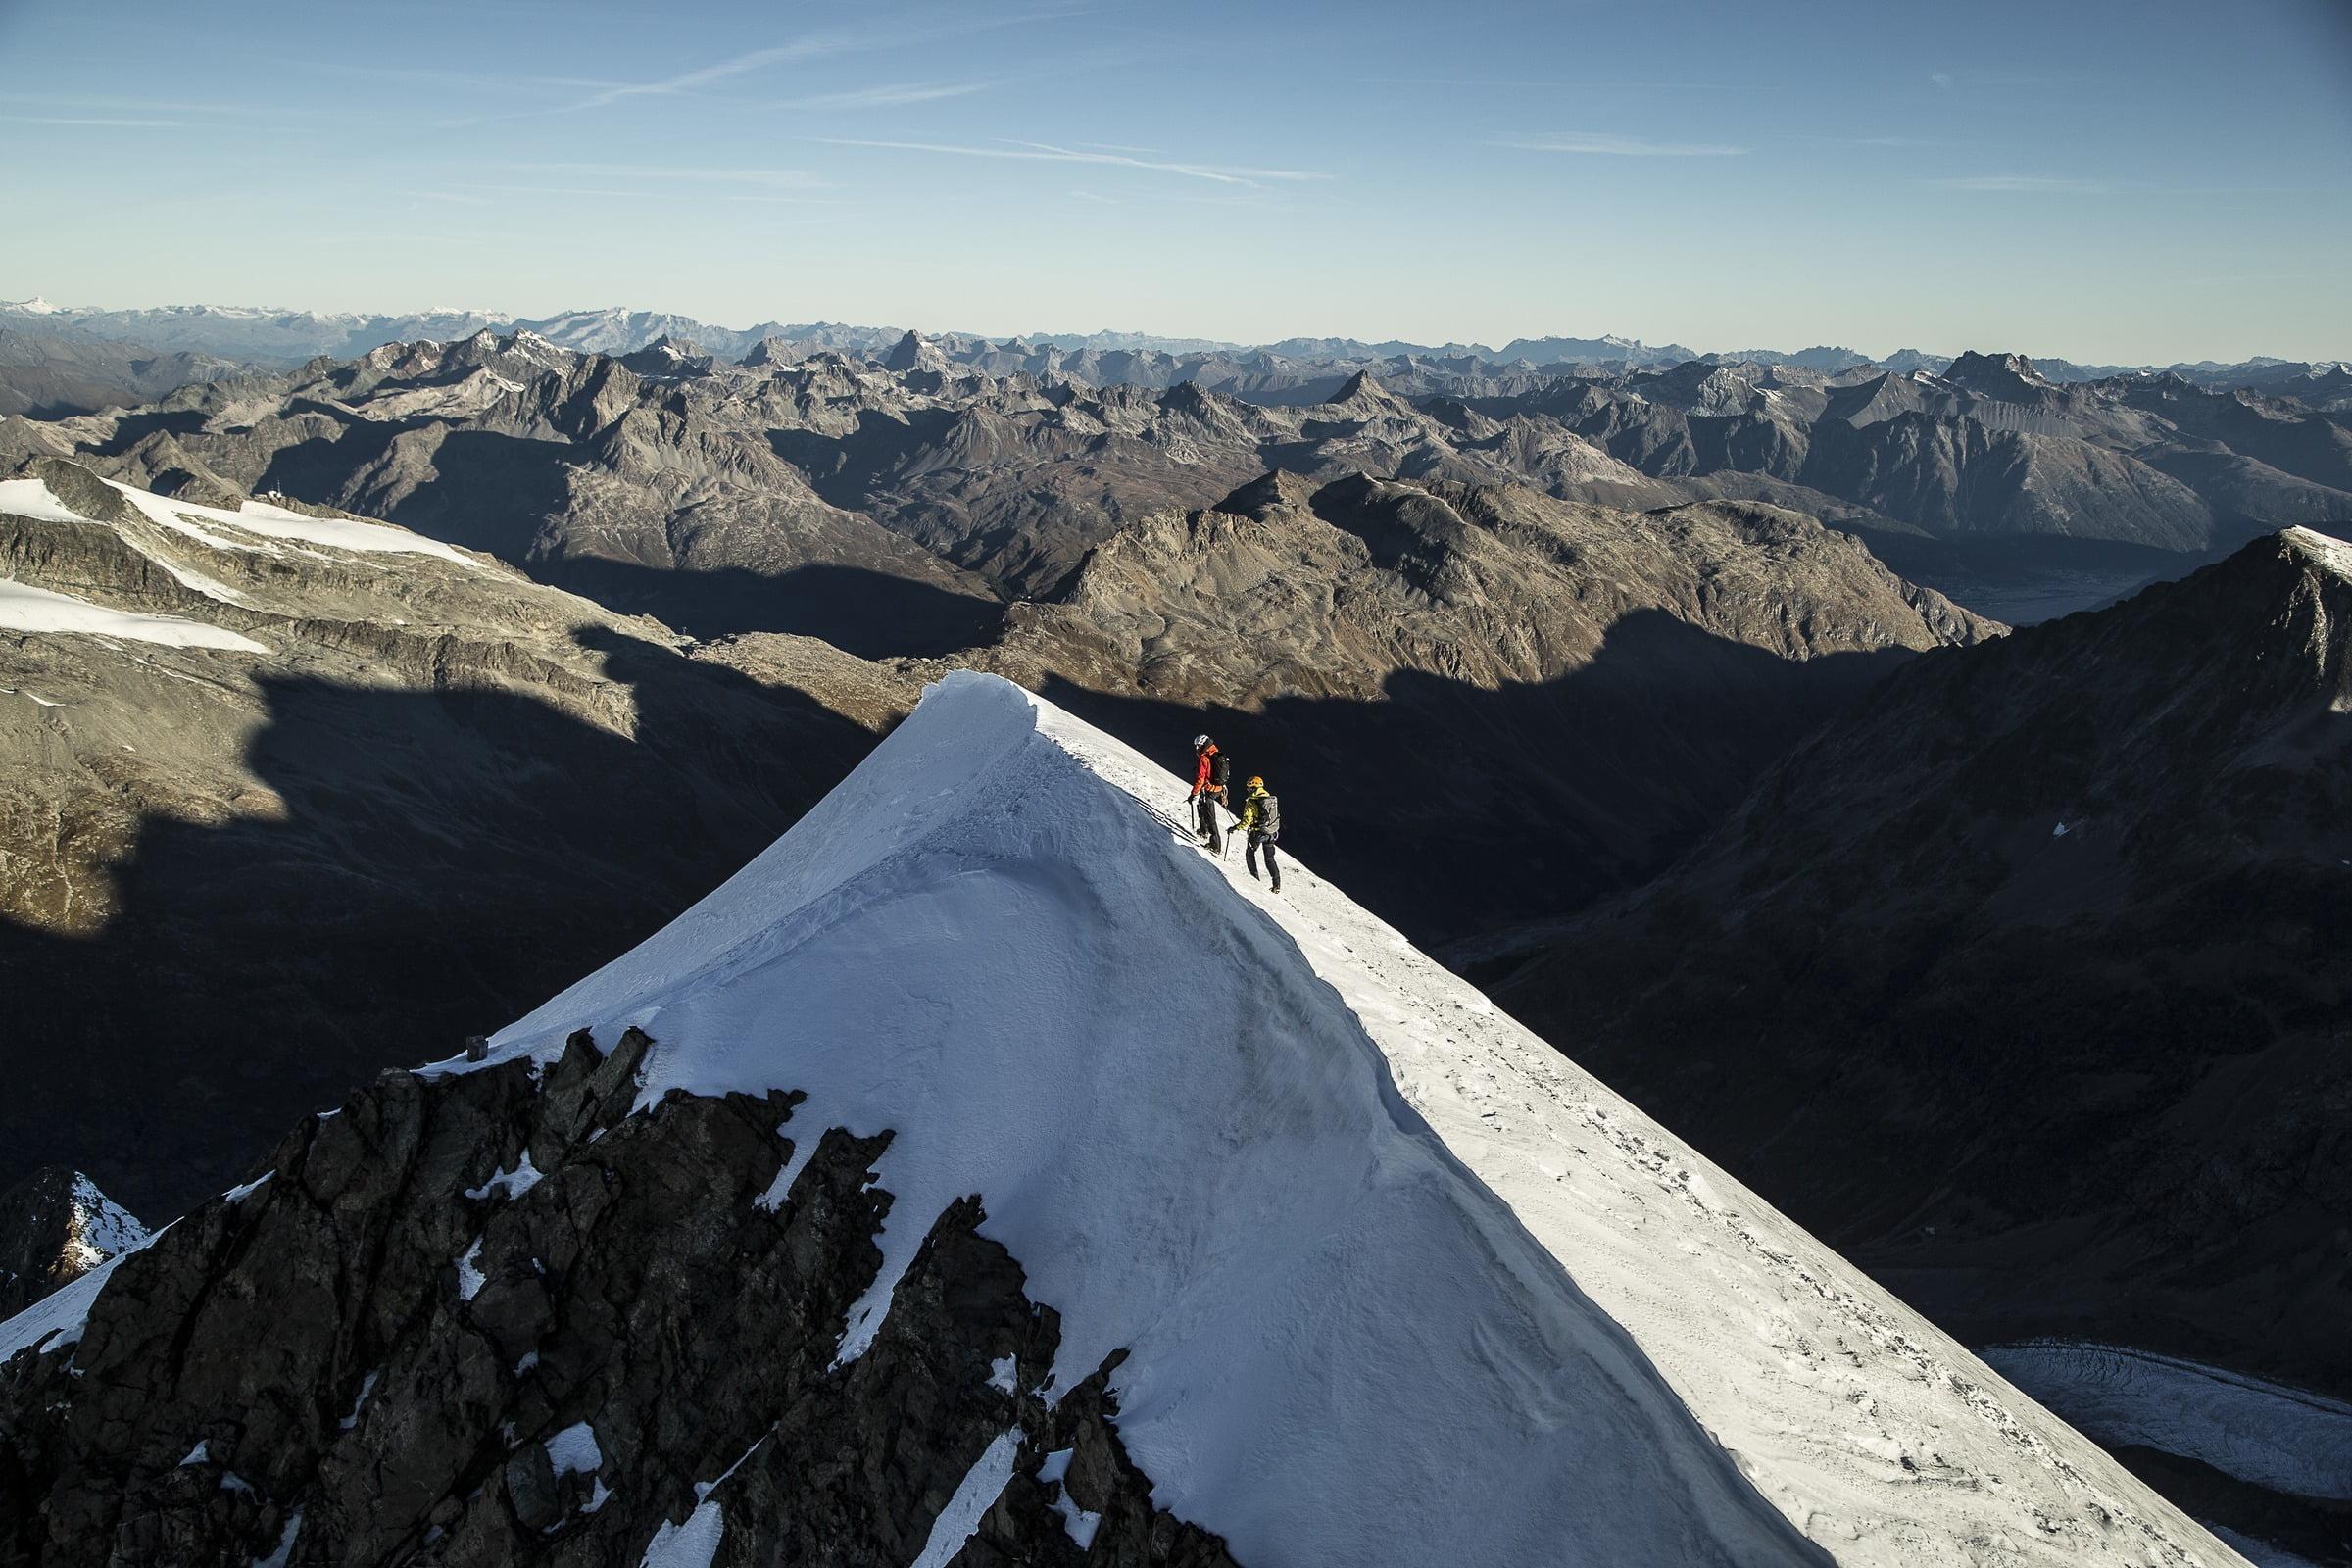 Mountaineering school Pontresina Ltd.